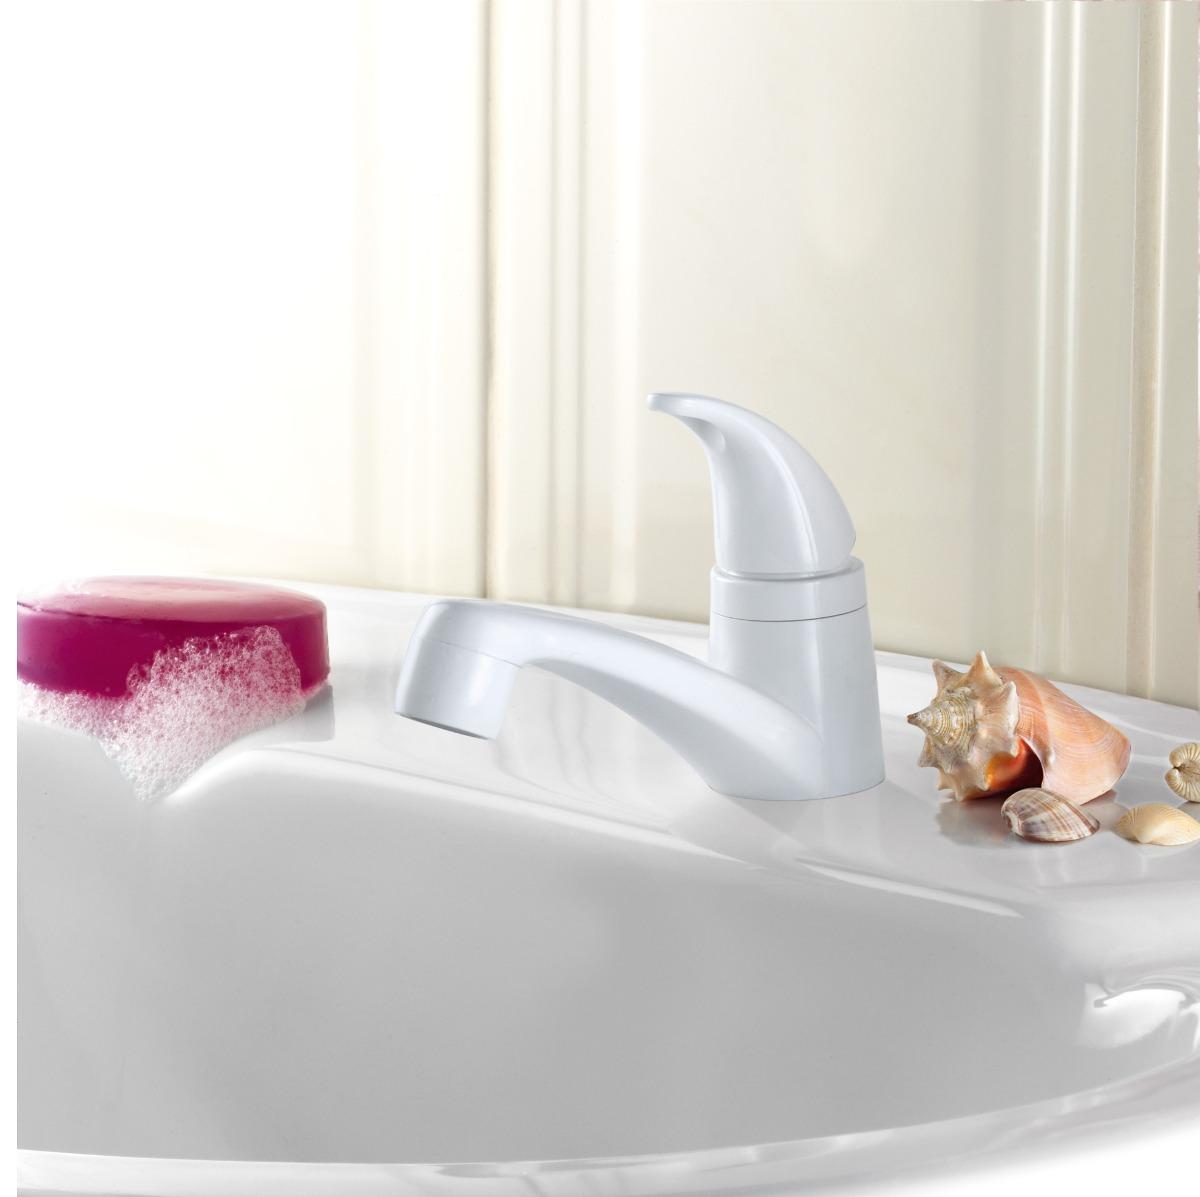 Torneira Para Banheiro Bancada Fortti Lorenzetti R$ 39 90 no  #891143 1200x1197 Bancada Banheiro Material